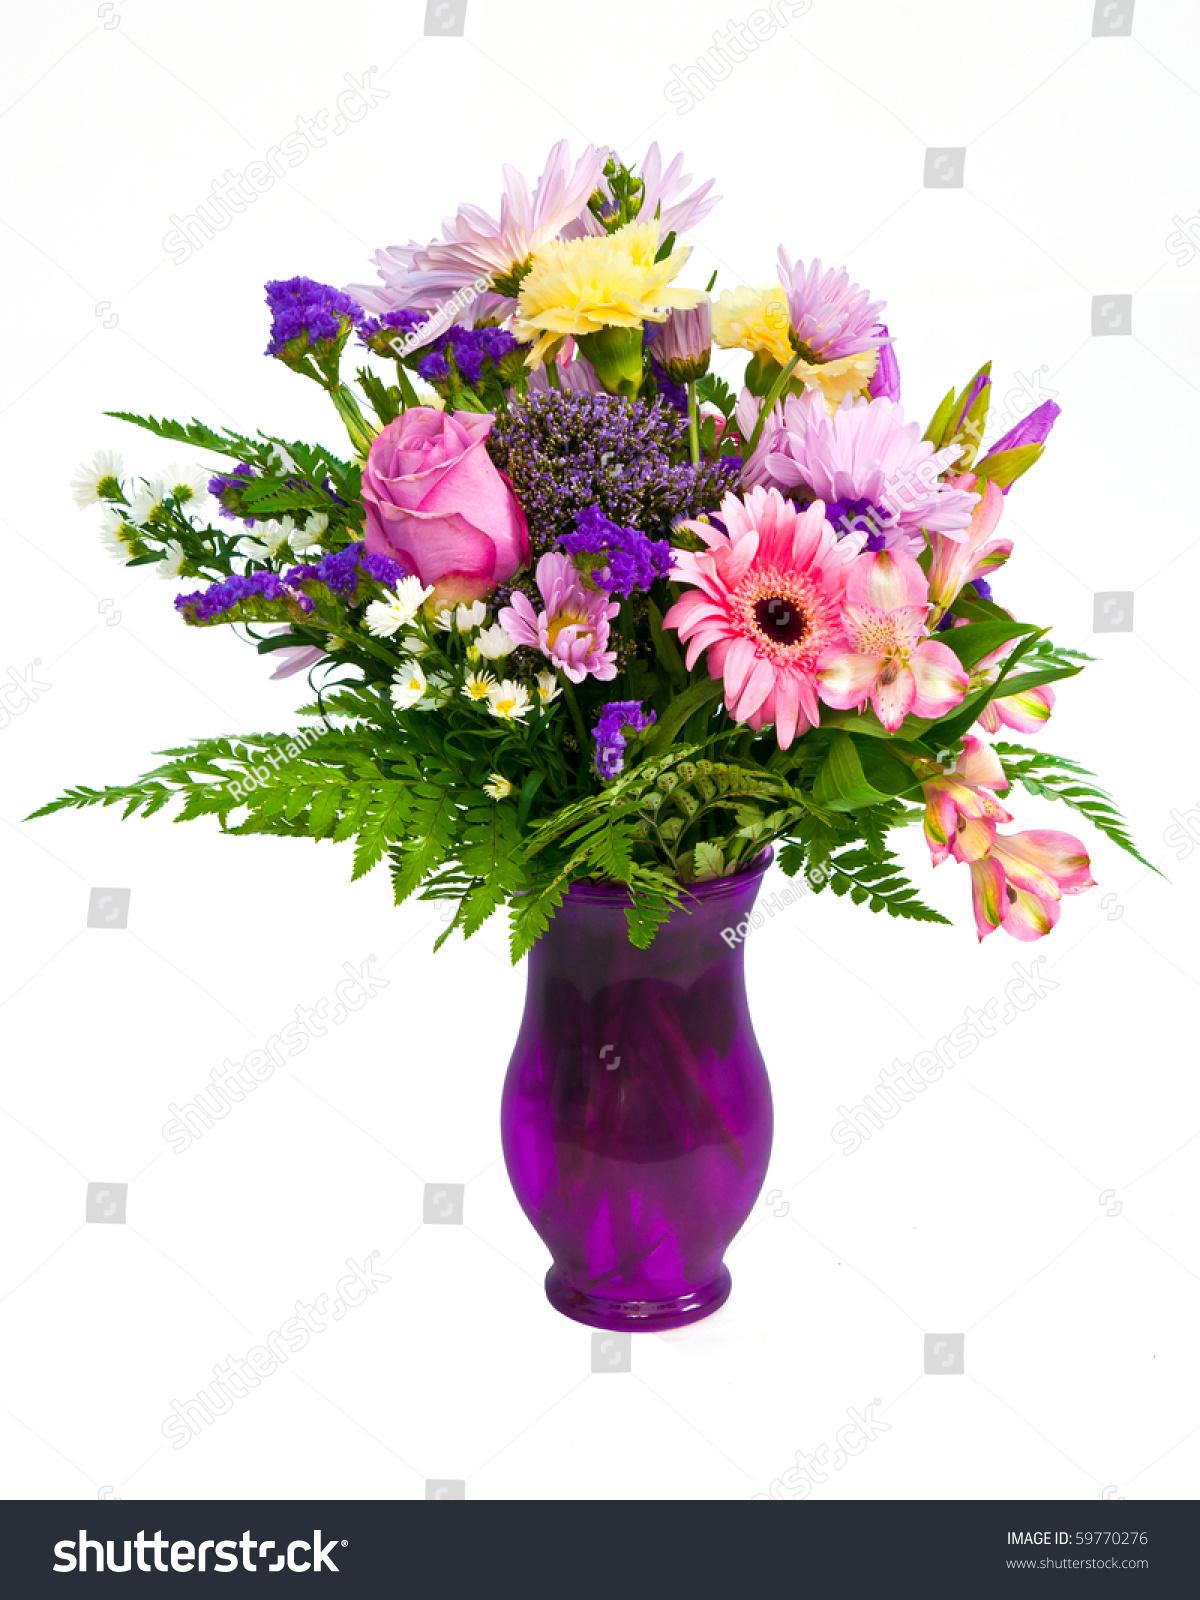 Colorful Flower Bouquet Arrangement Vase Isolated Stock Photo ...